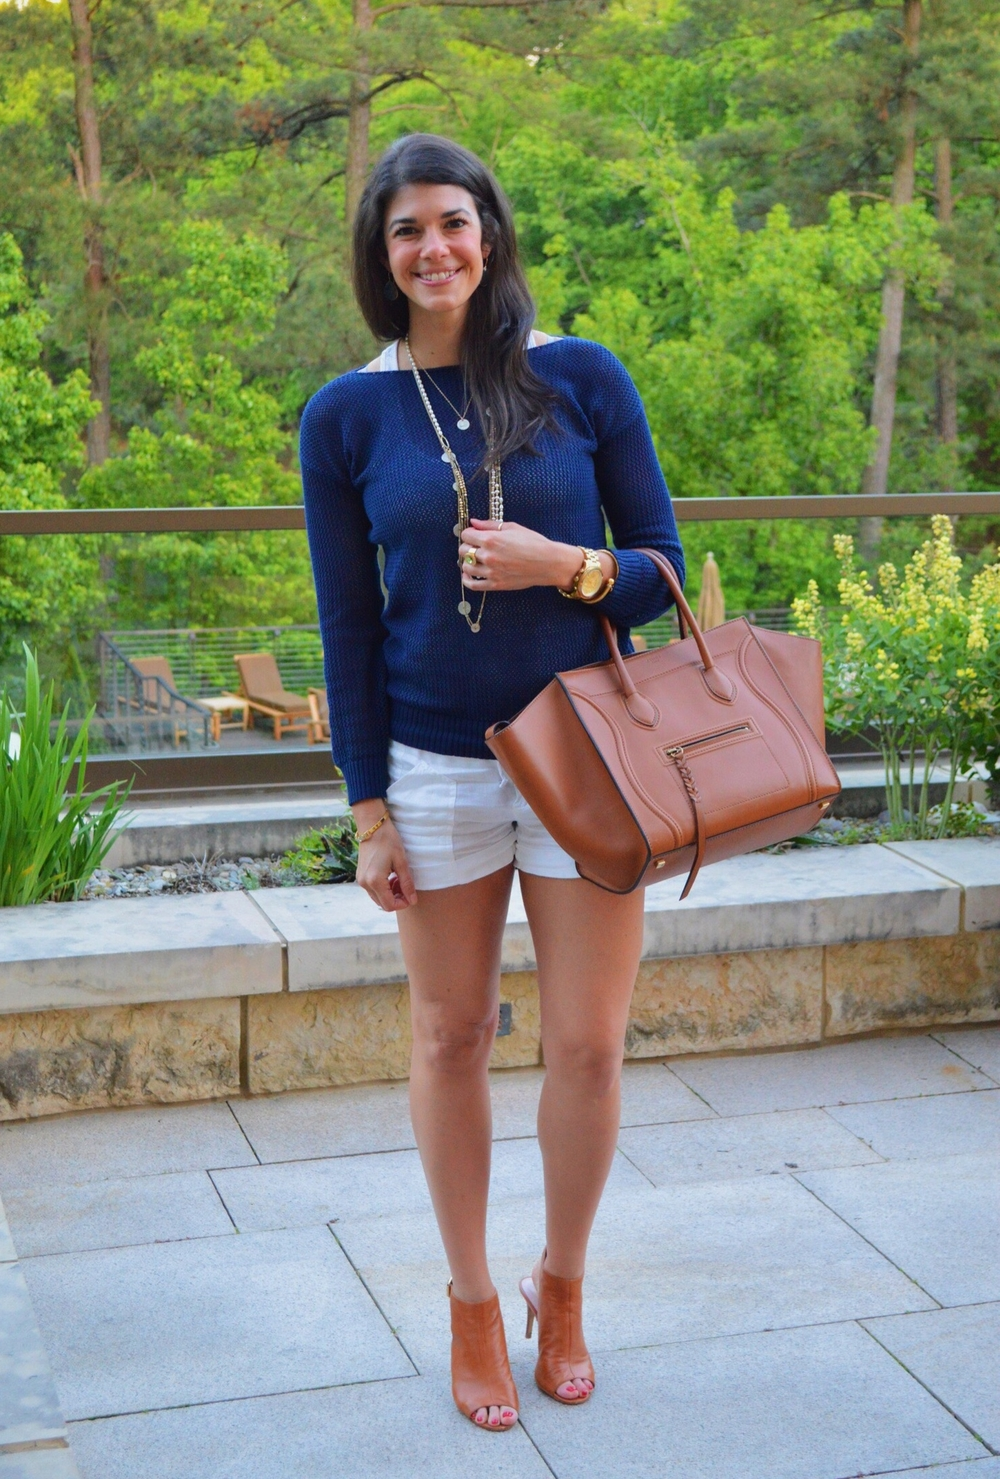 LaurenSchwaiger-Style-Blog-Spring-Style-White-Shorts-Navy-Sweater.jpg